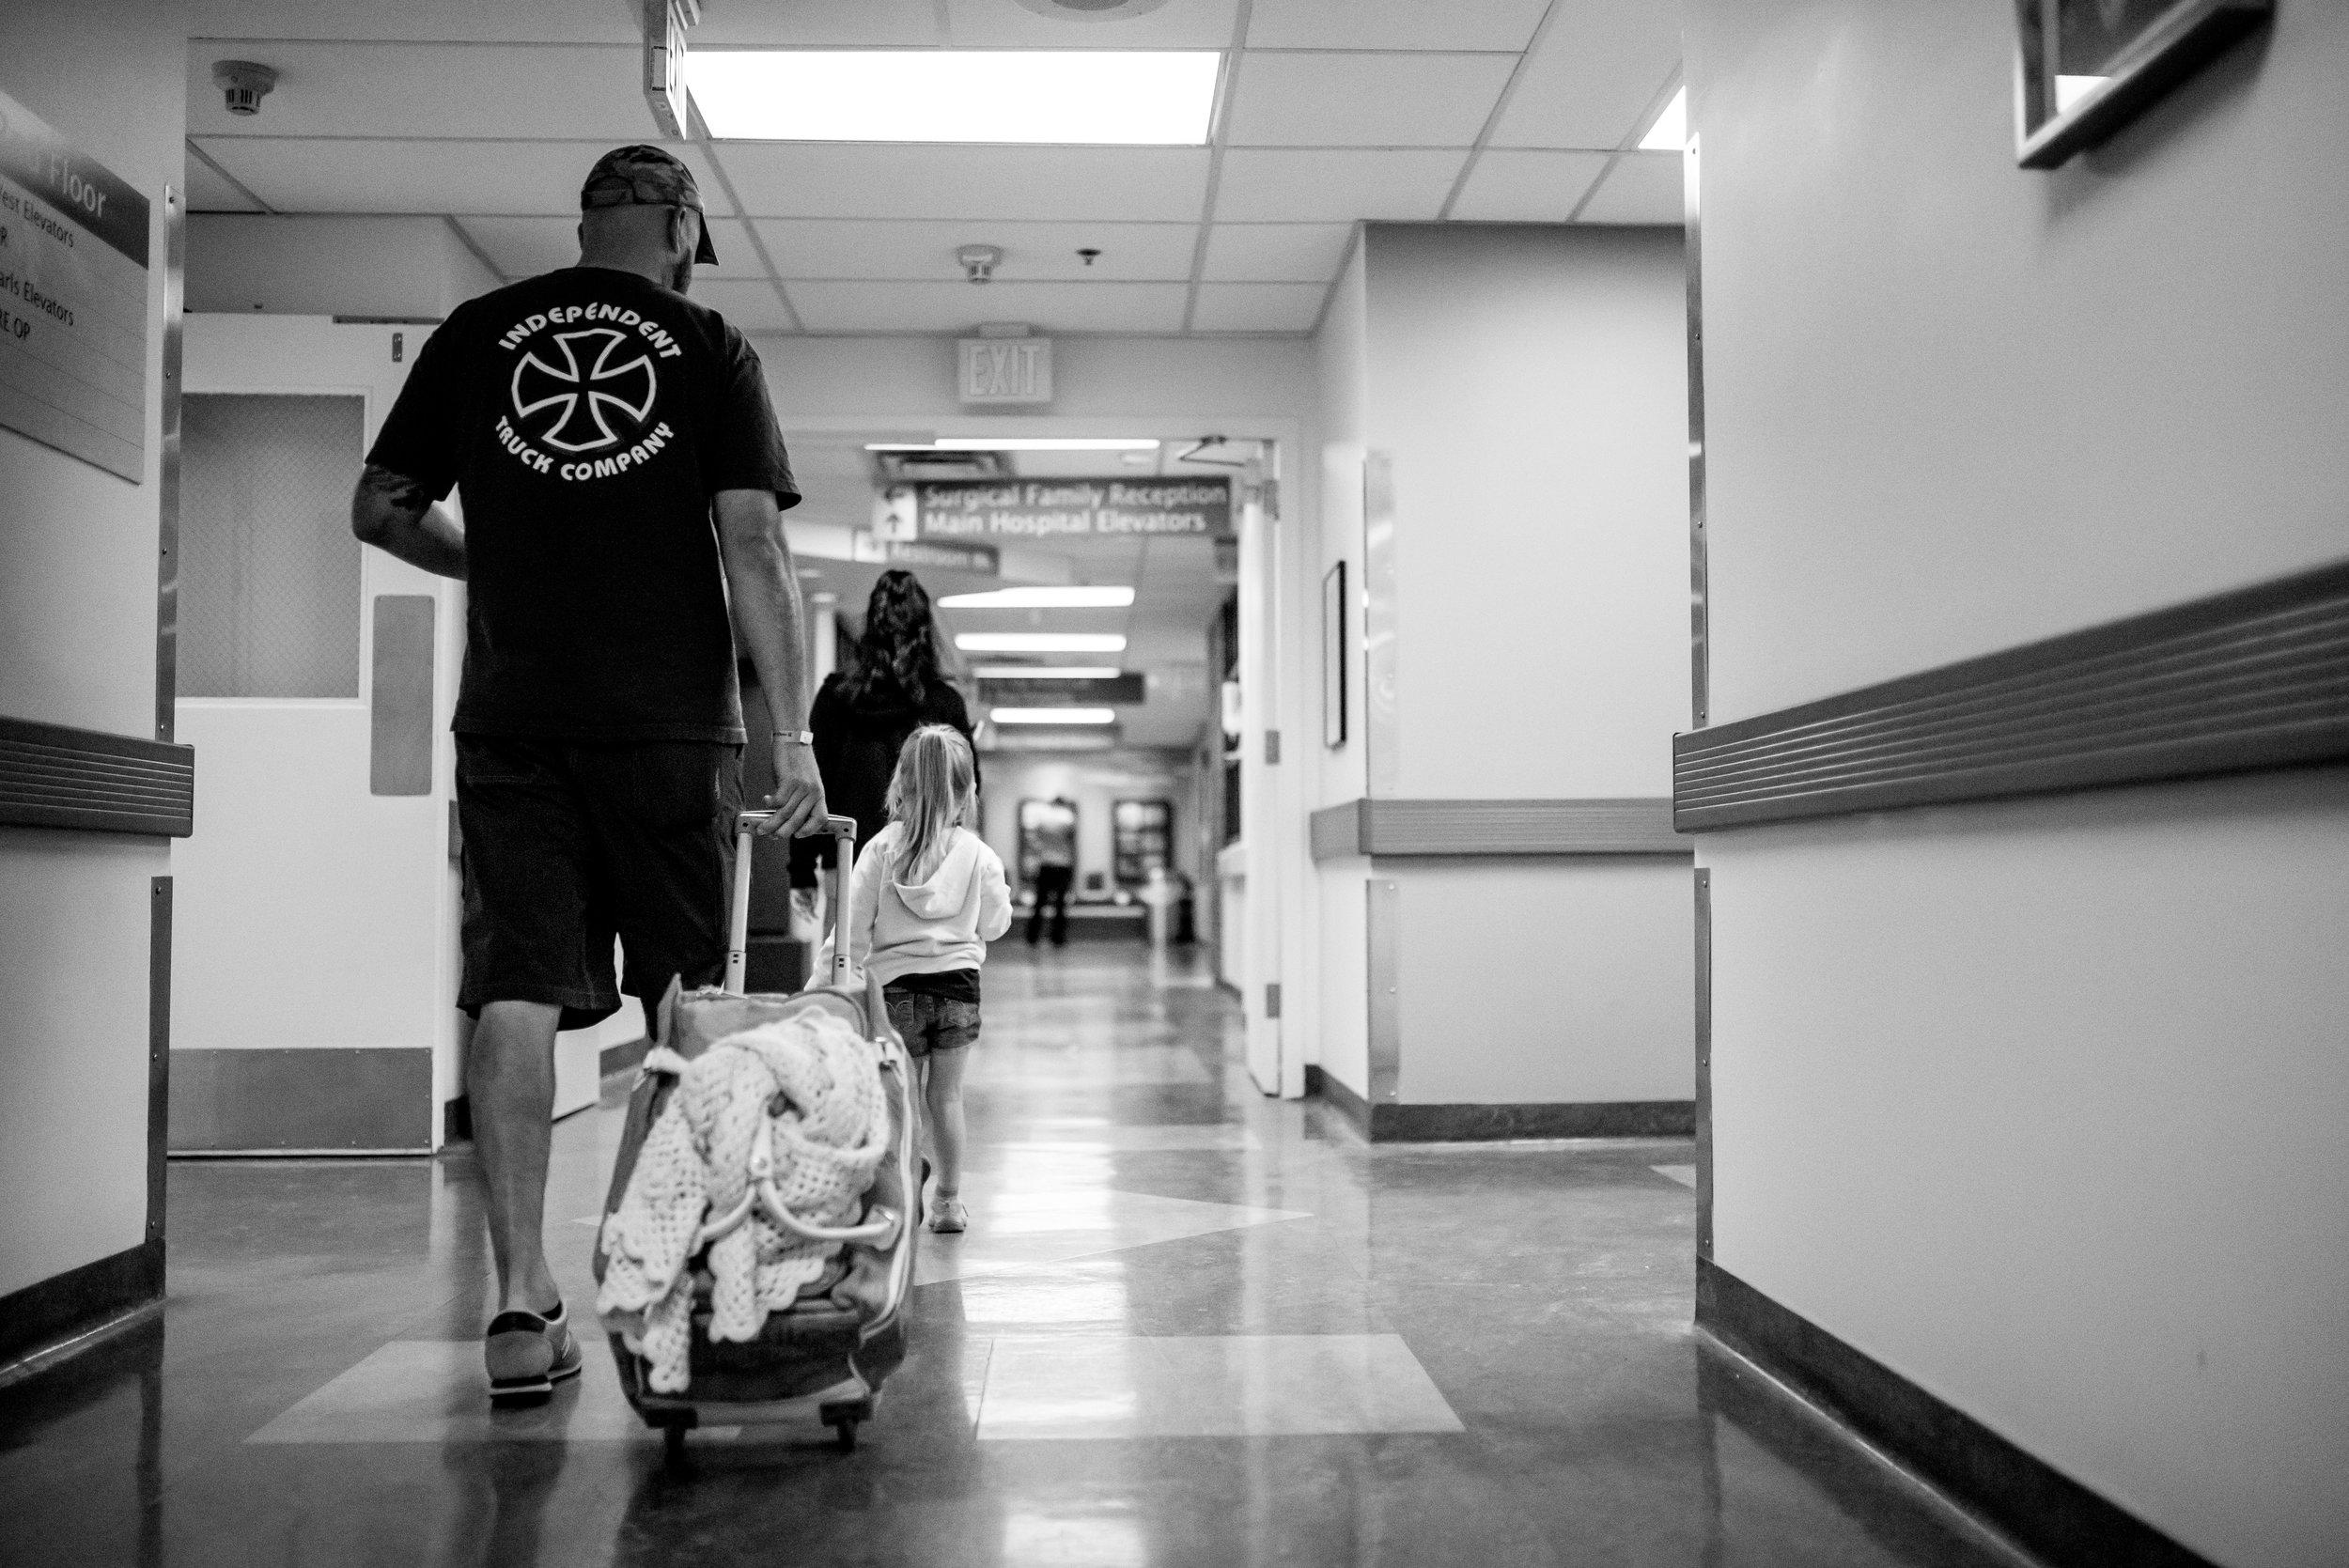 Walking to surgery prep children's hospital